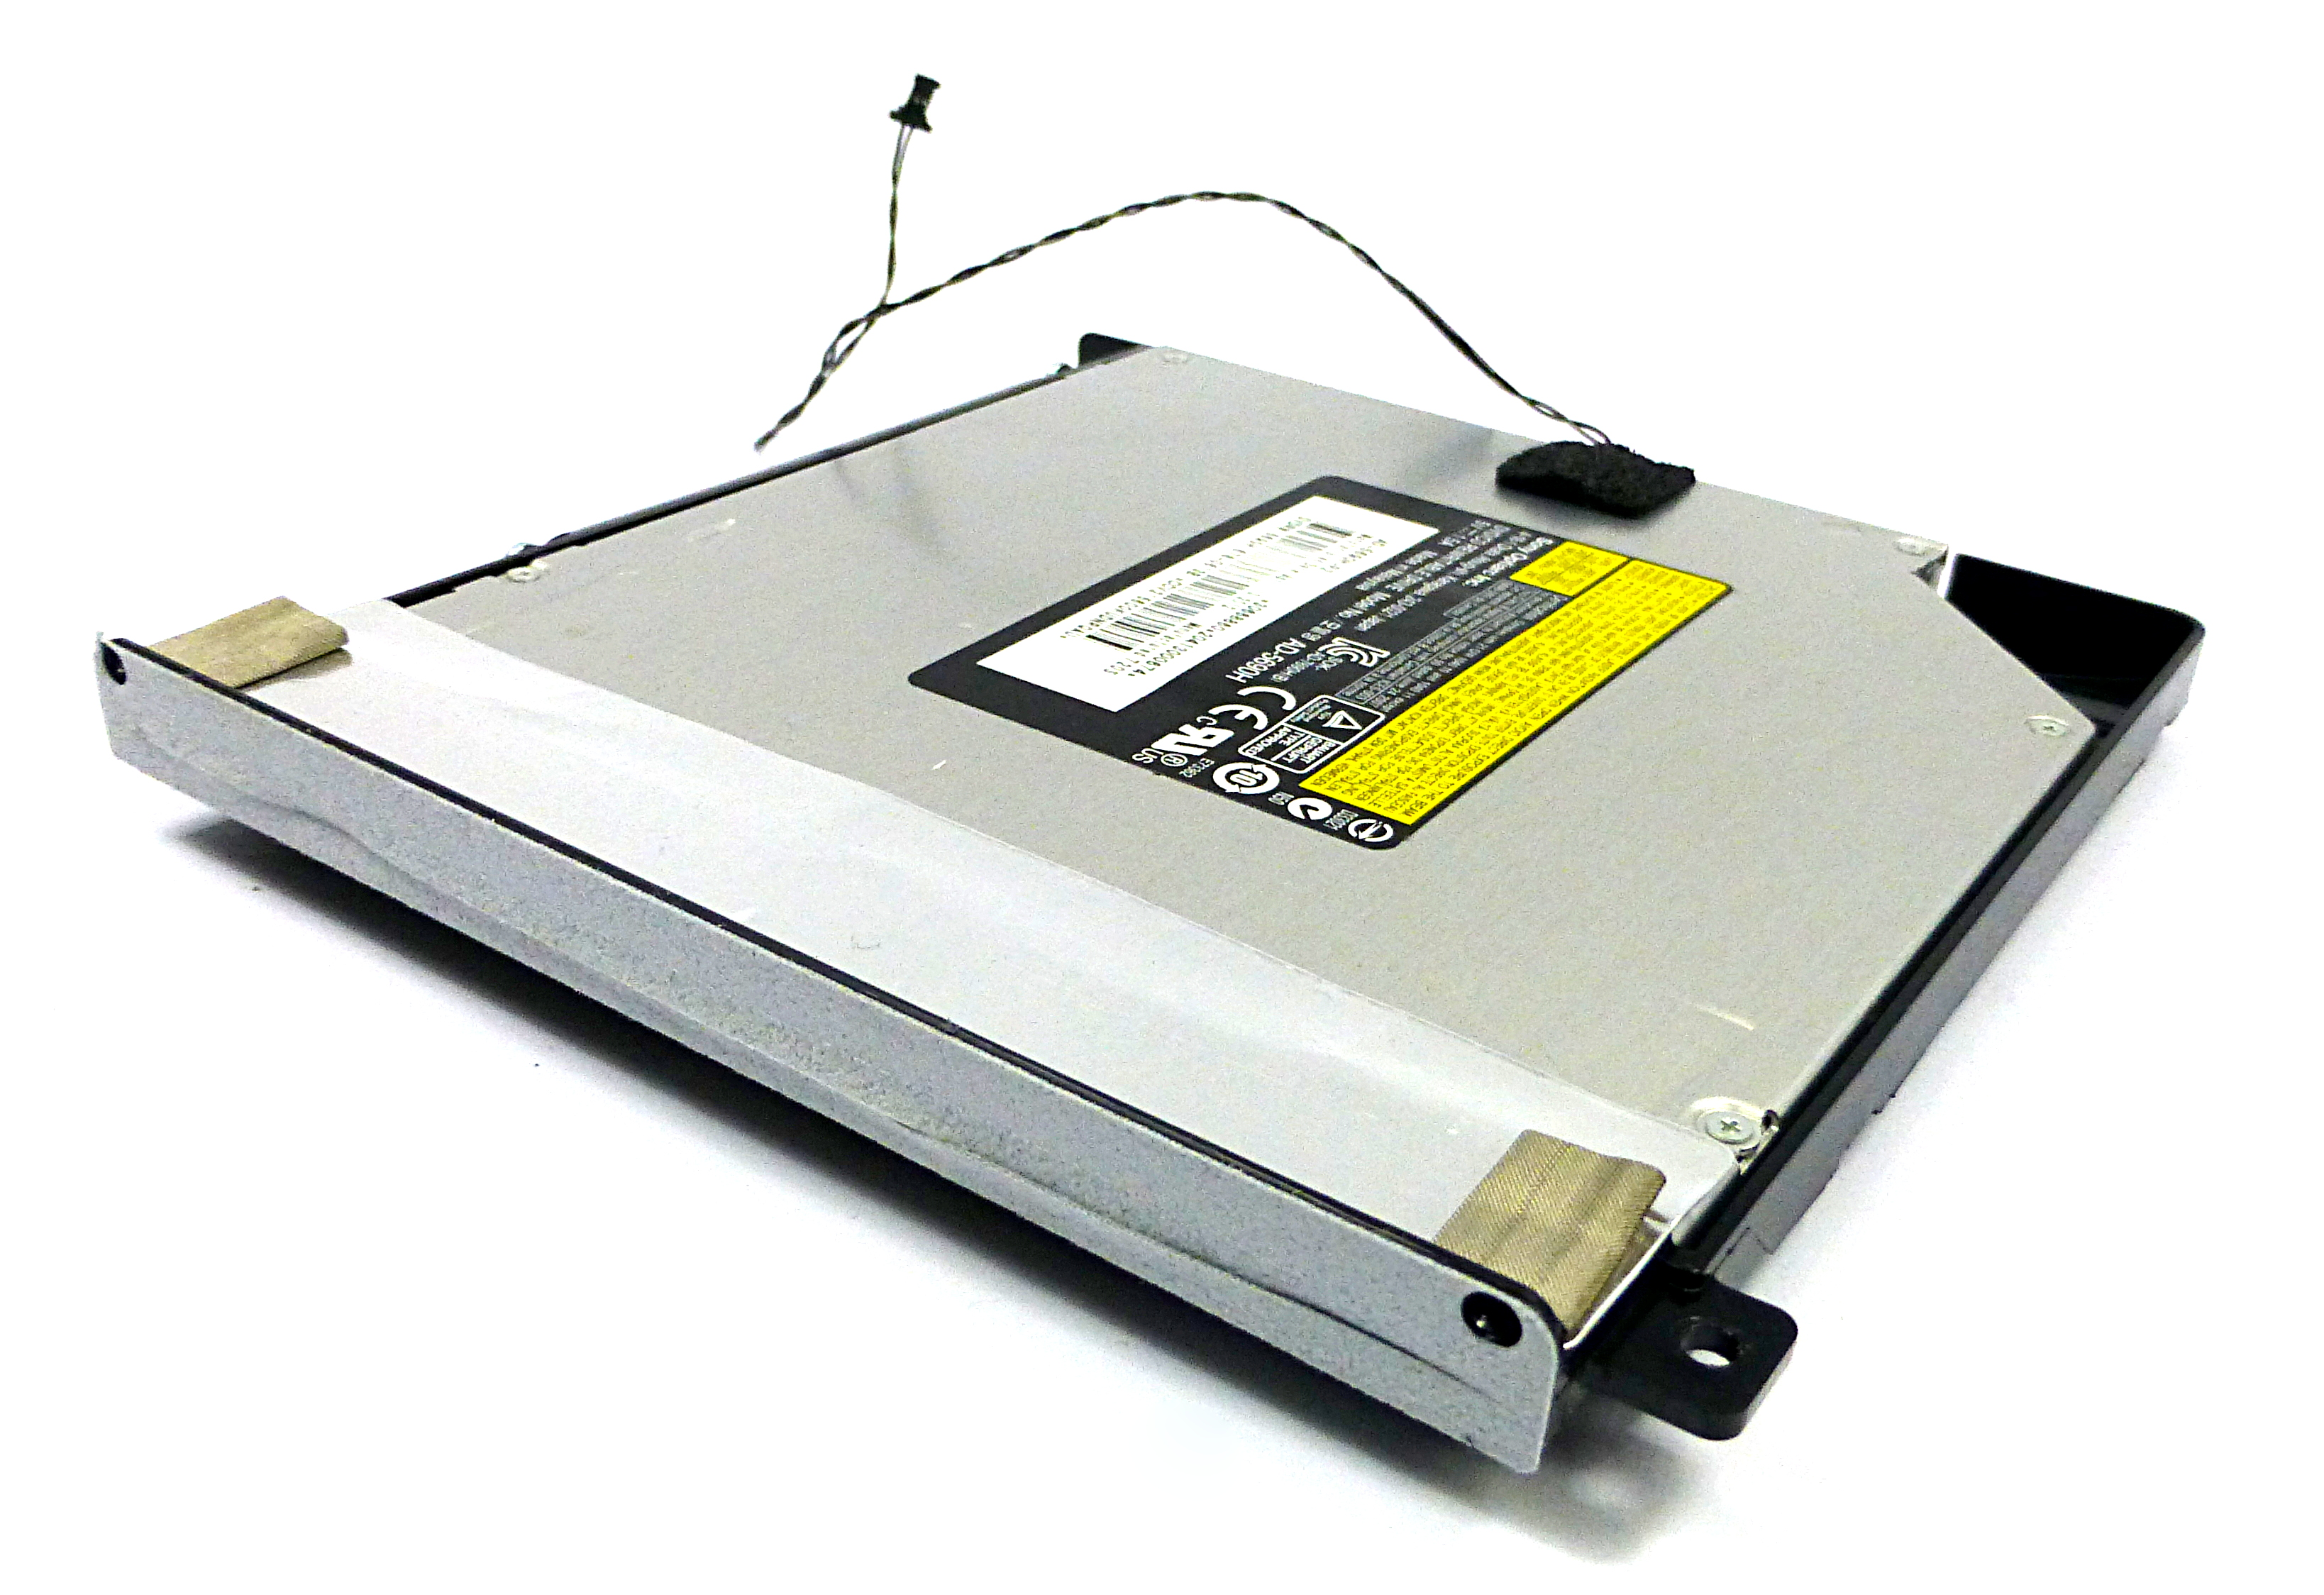 Apple 678-0613B  Rewritable SATA Internal DVD/CD Optical Drive AD-5690H